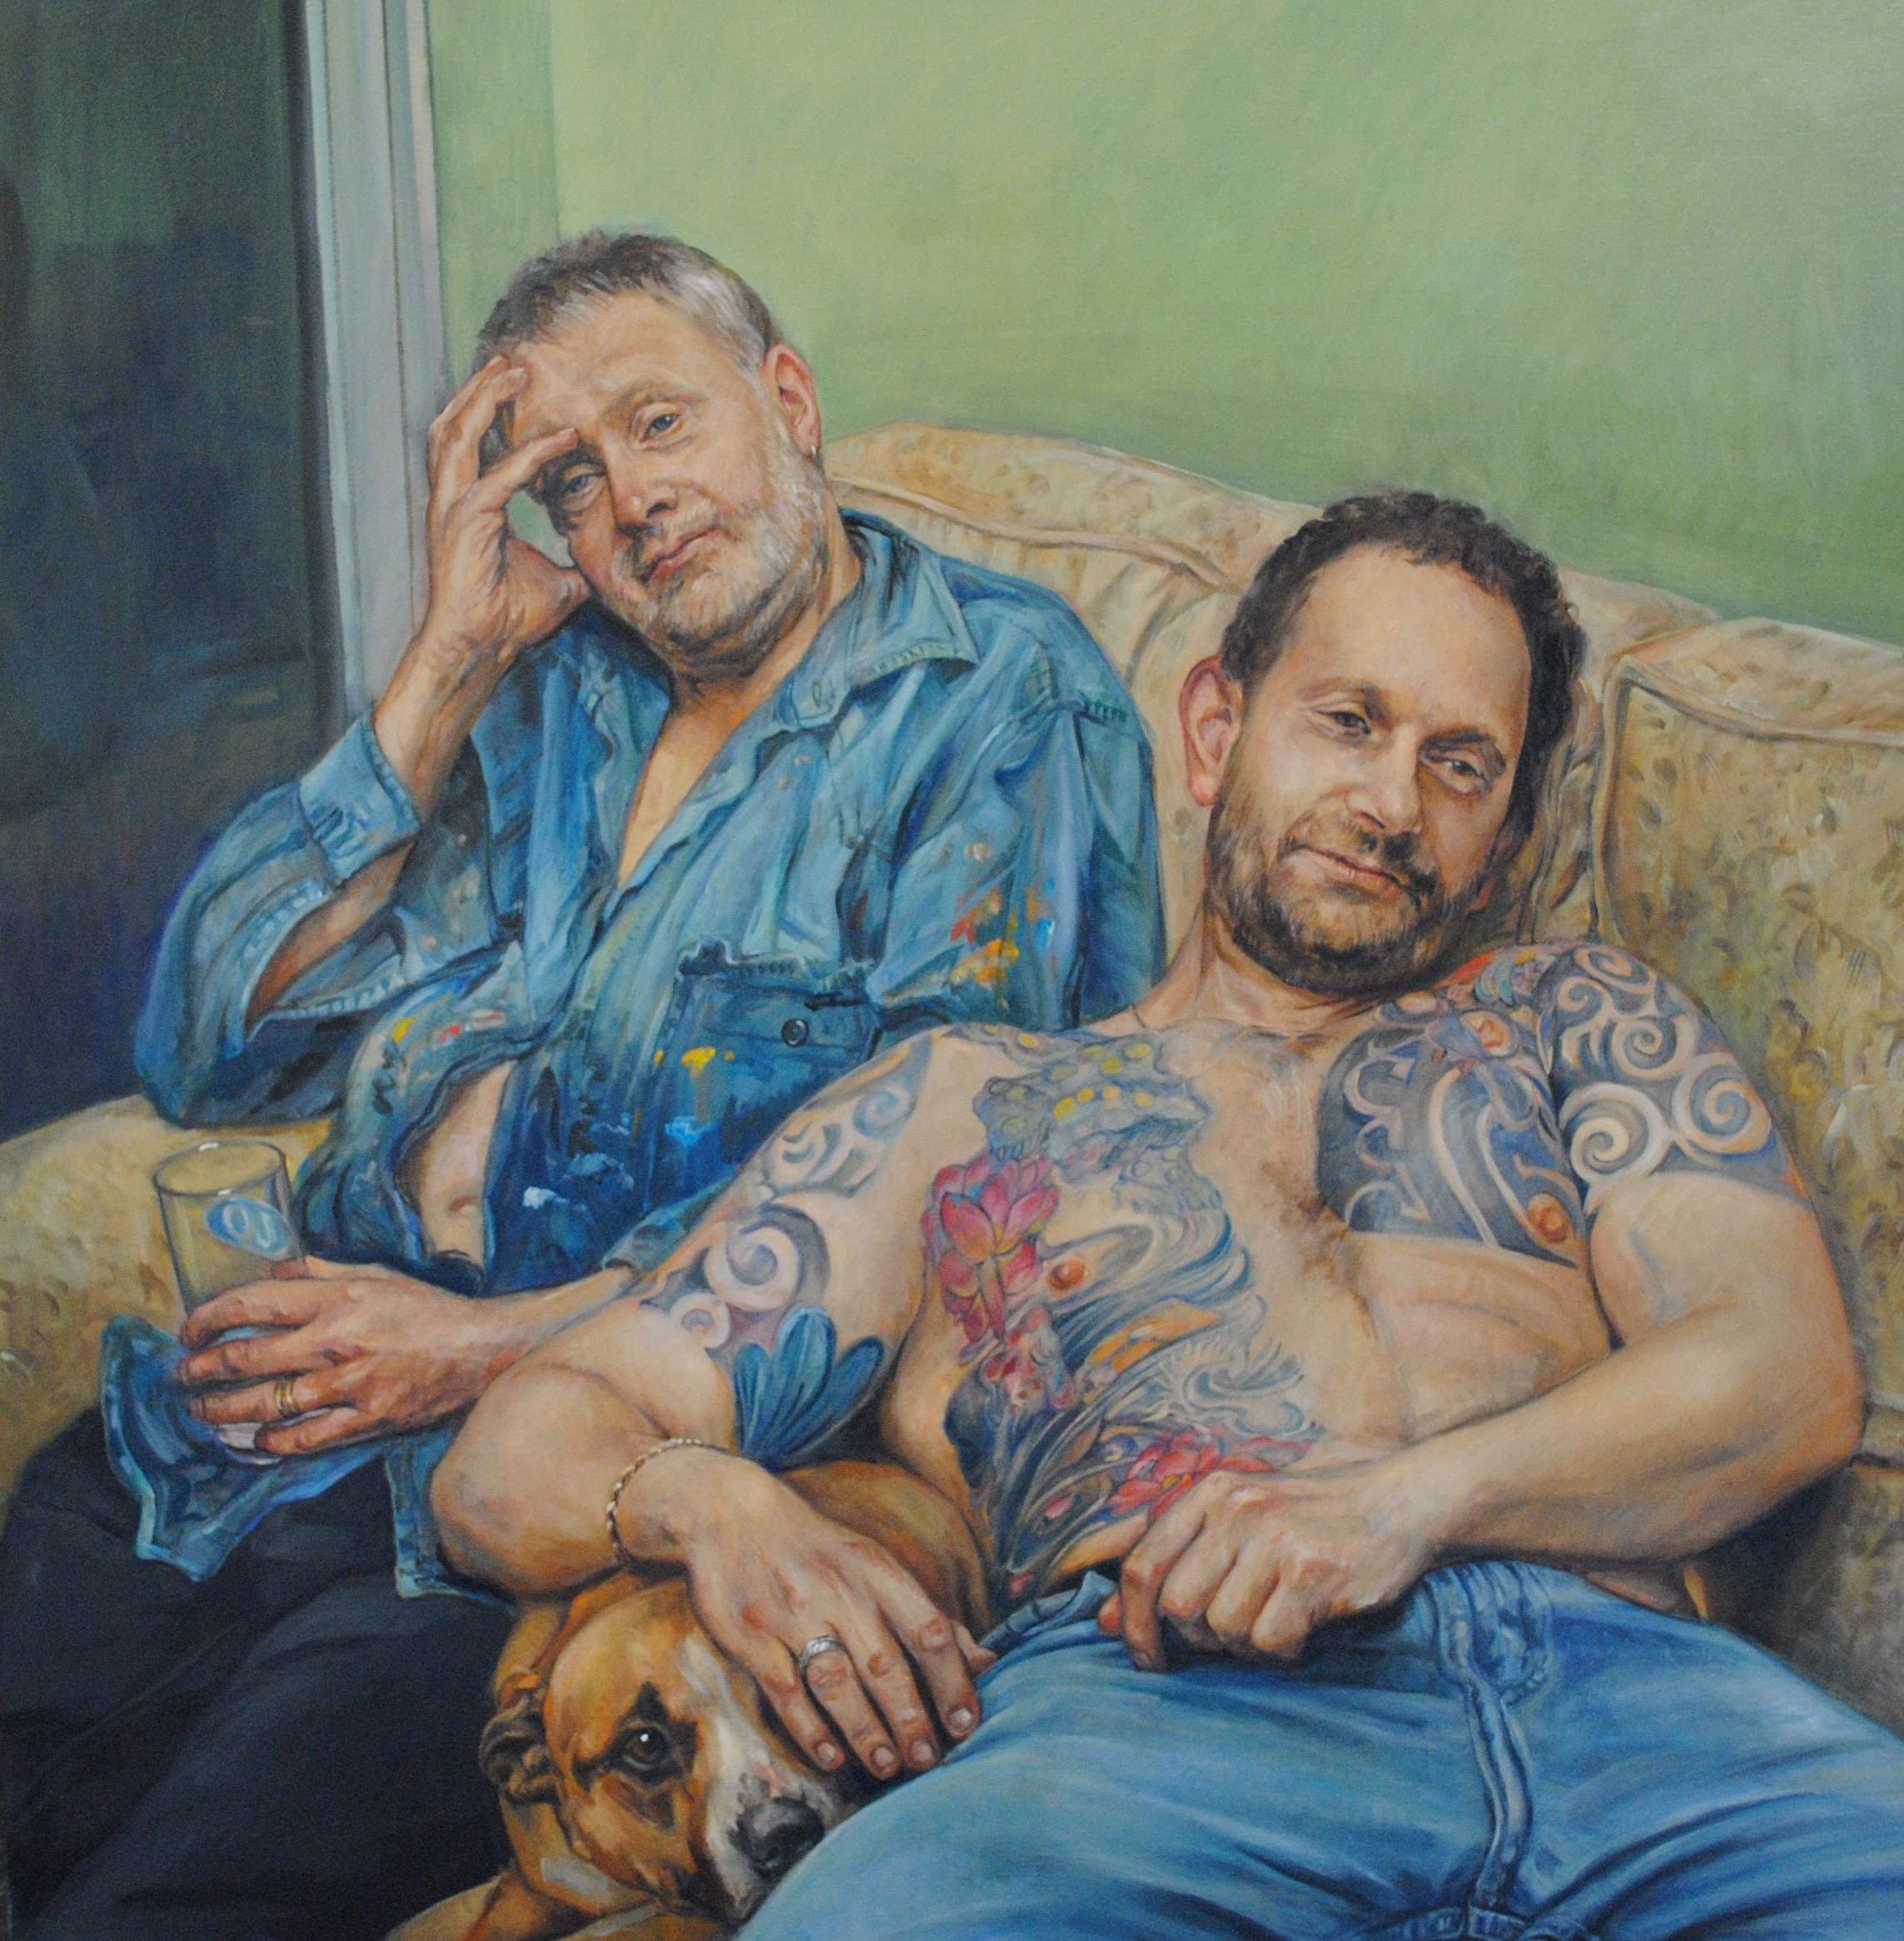 Jane Allison, John and Robert with Nellie, oil paint on canvas, 100cm x 90cm x 2cm,  http://www.janeallisonportraits.co.uk